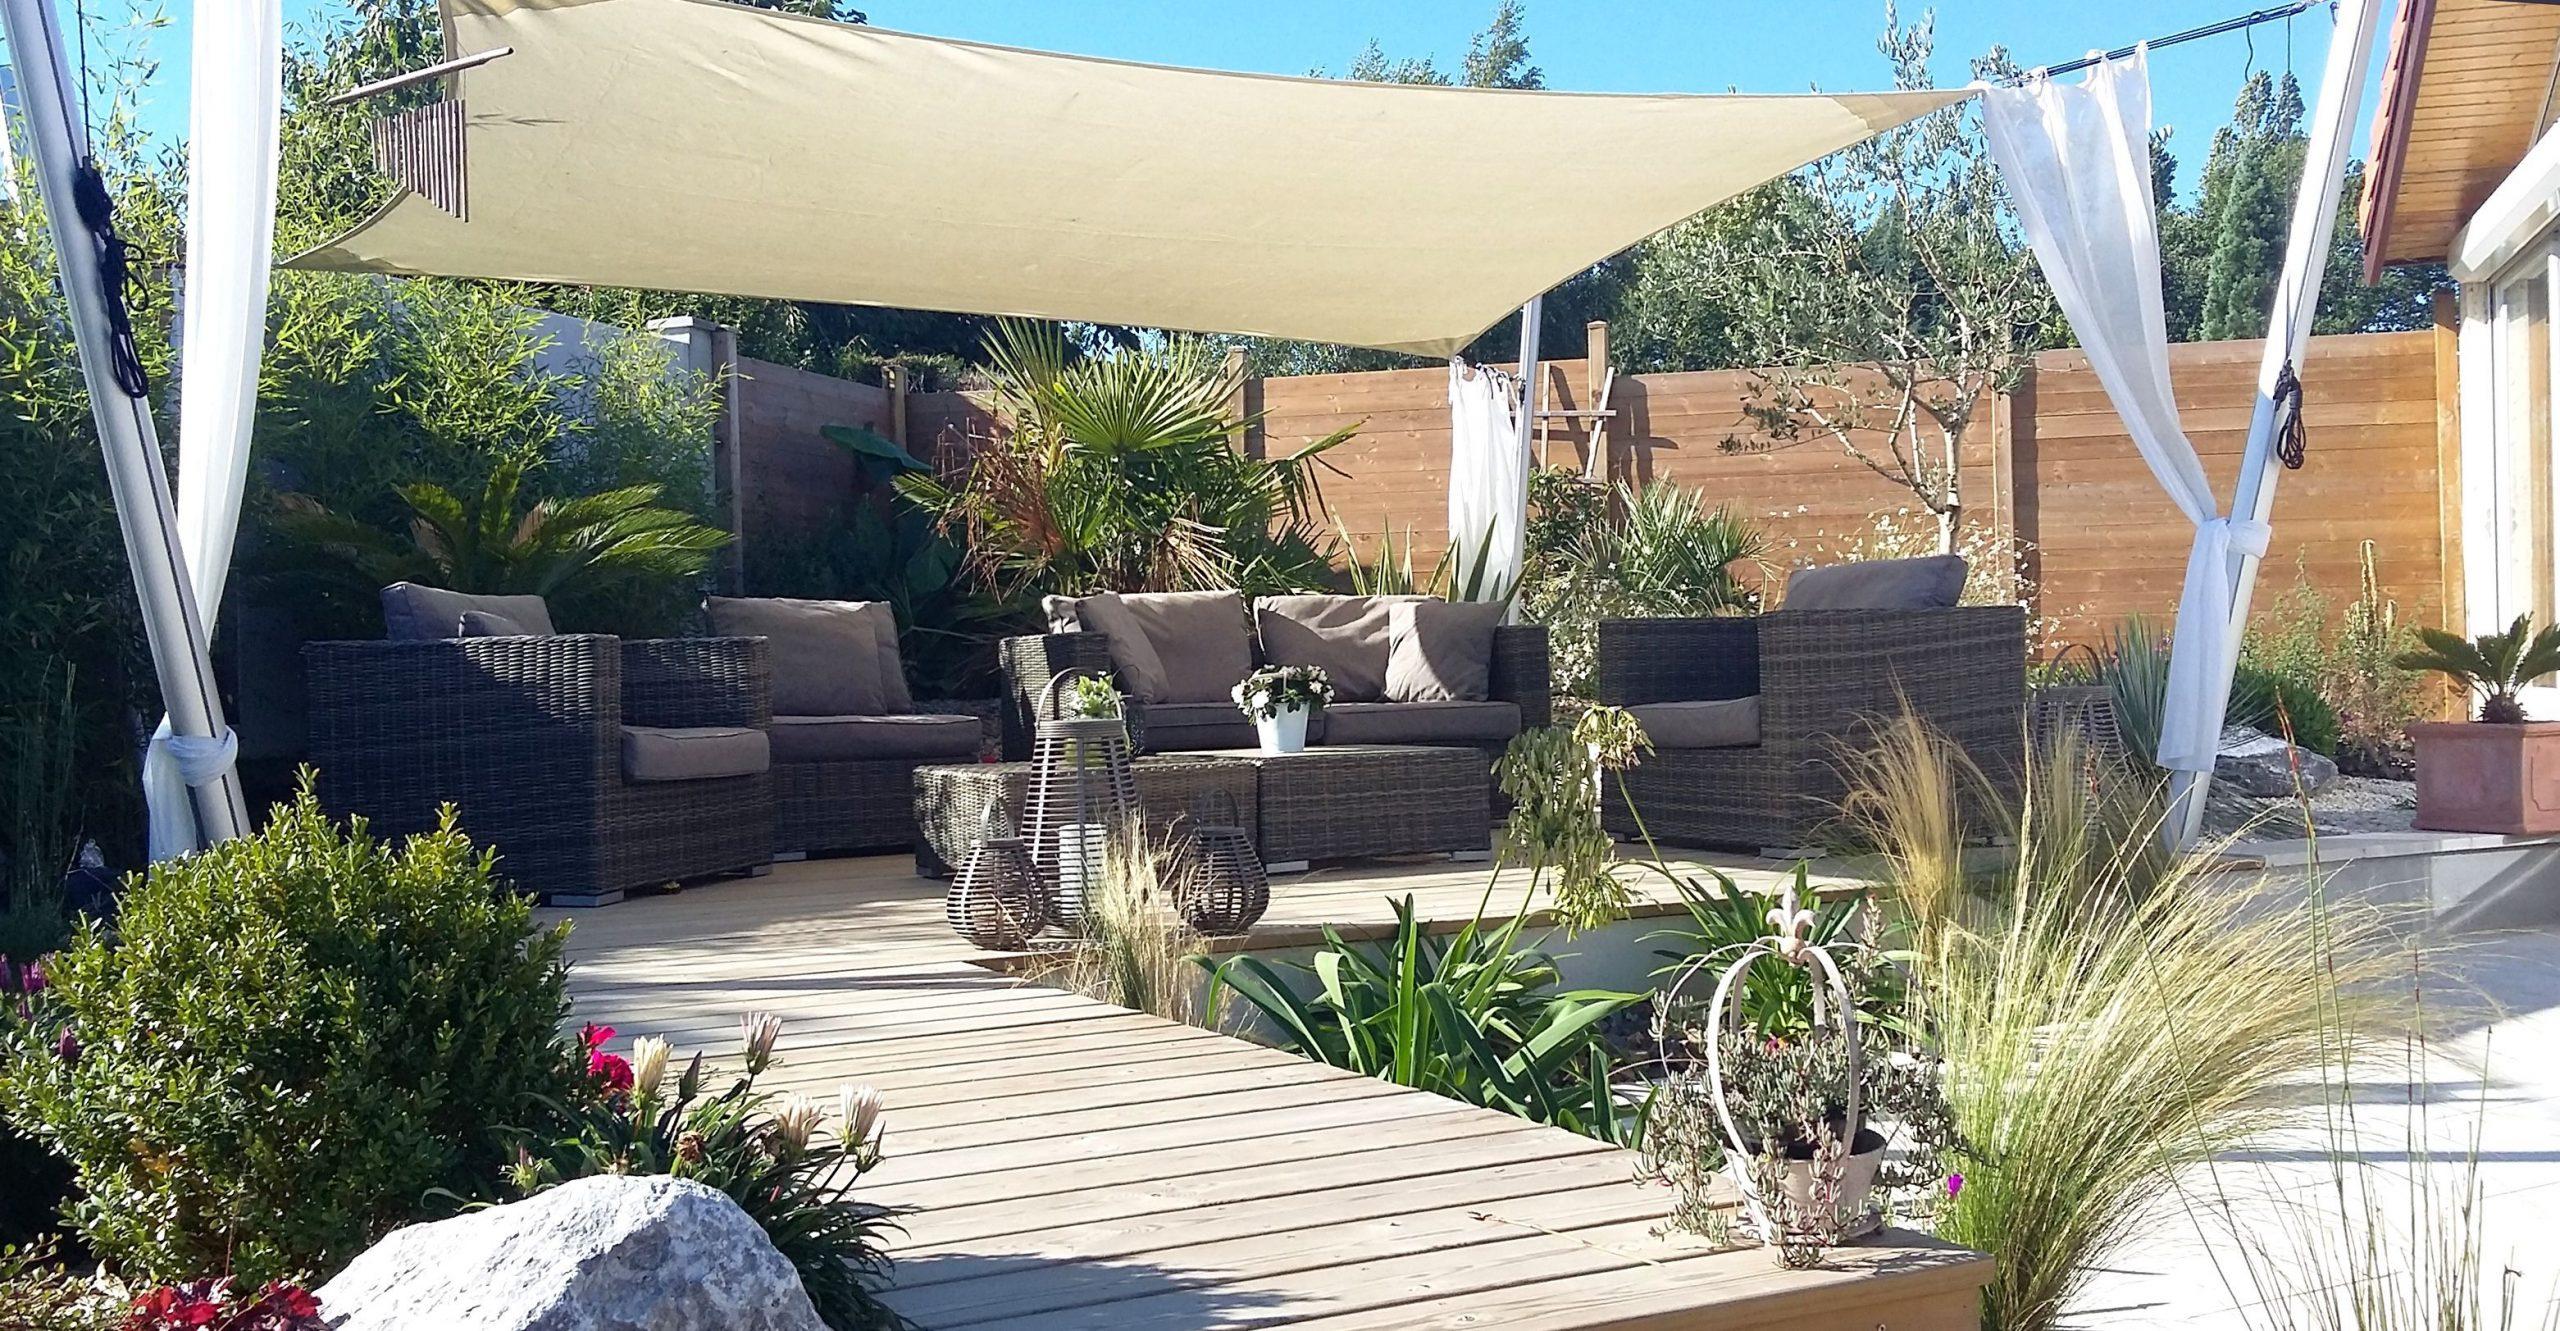 Aménagement terrasse par Obojardin